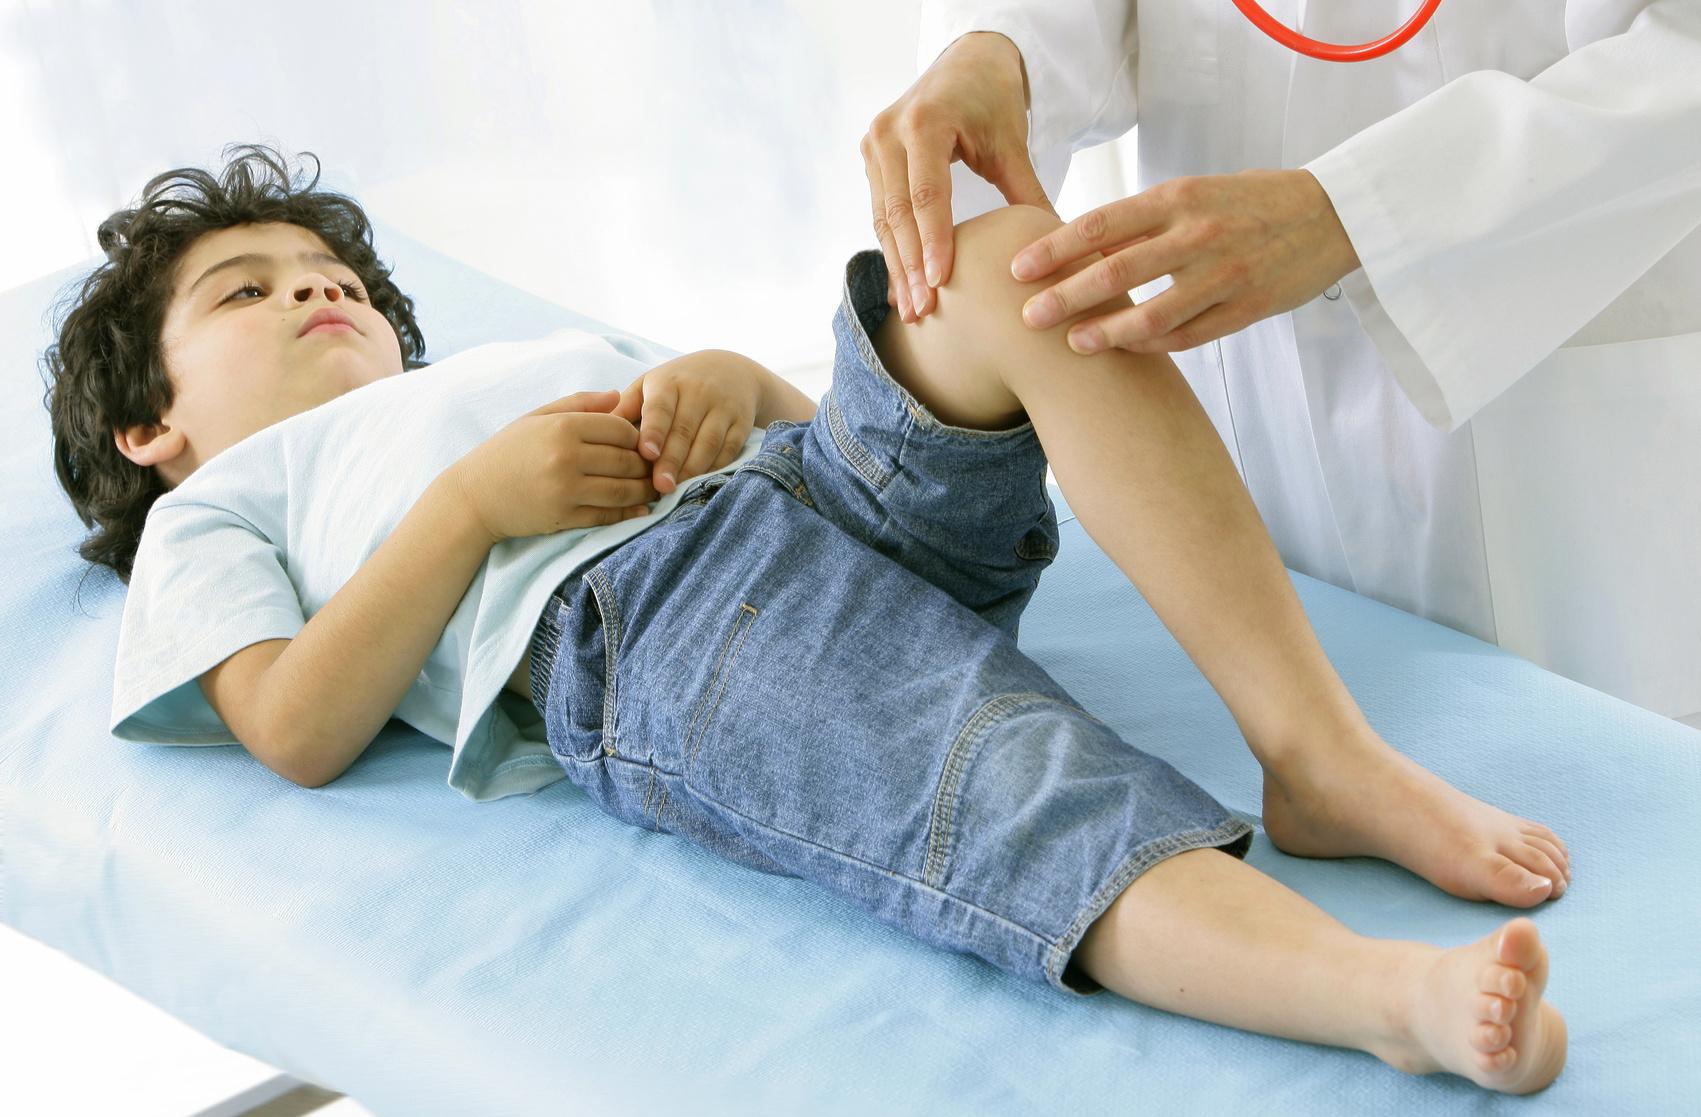 Orthopédie - Luxation du genou